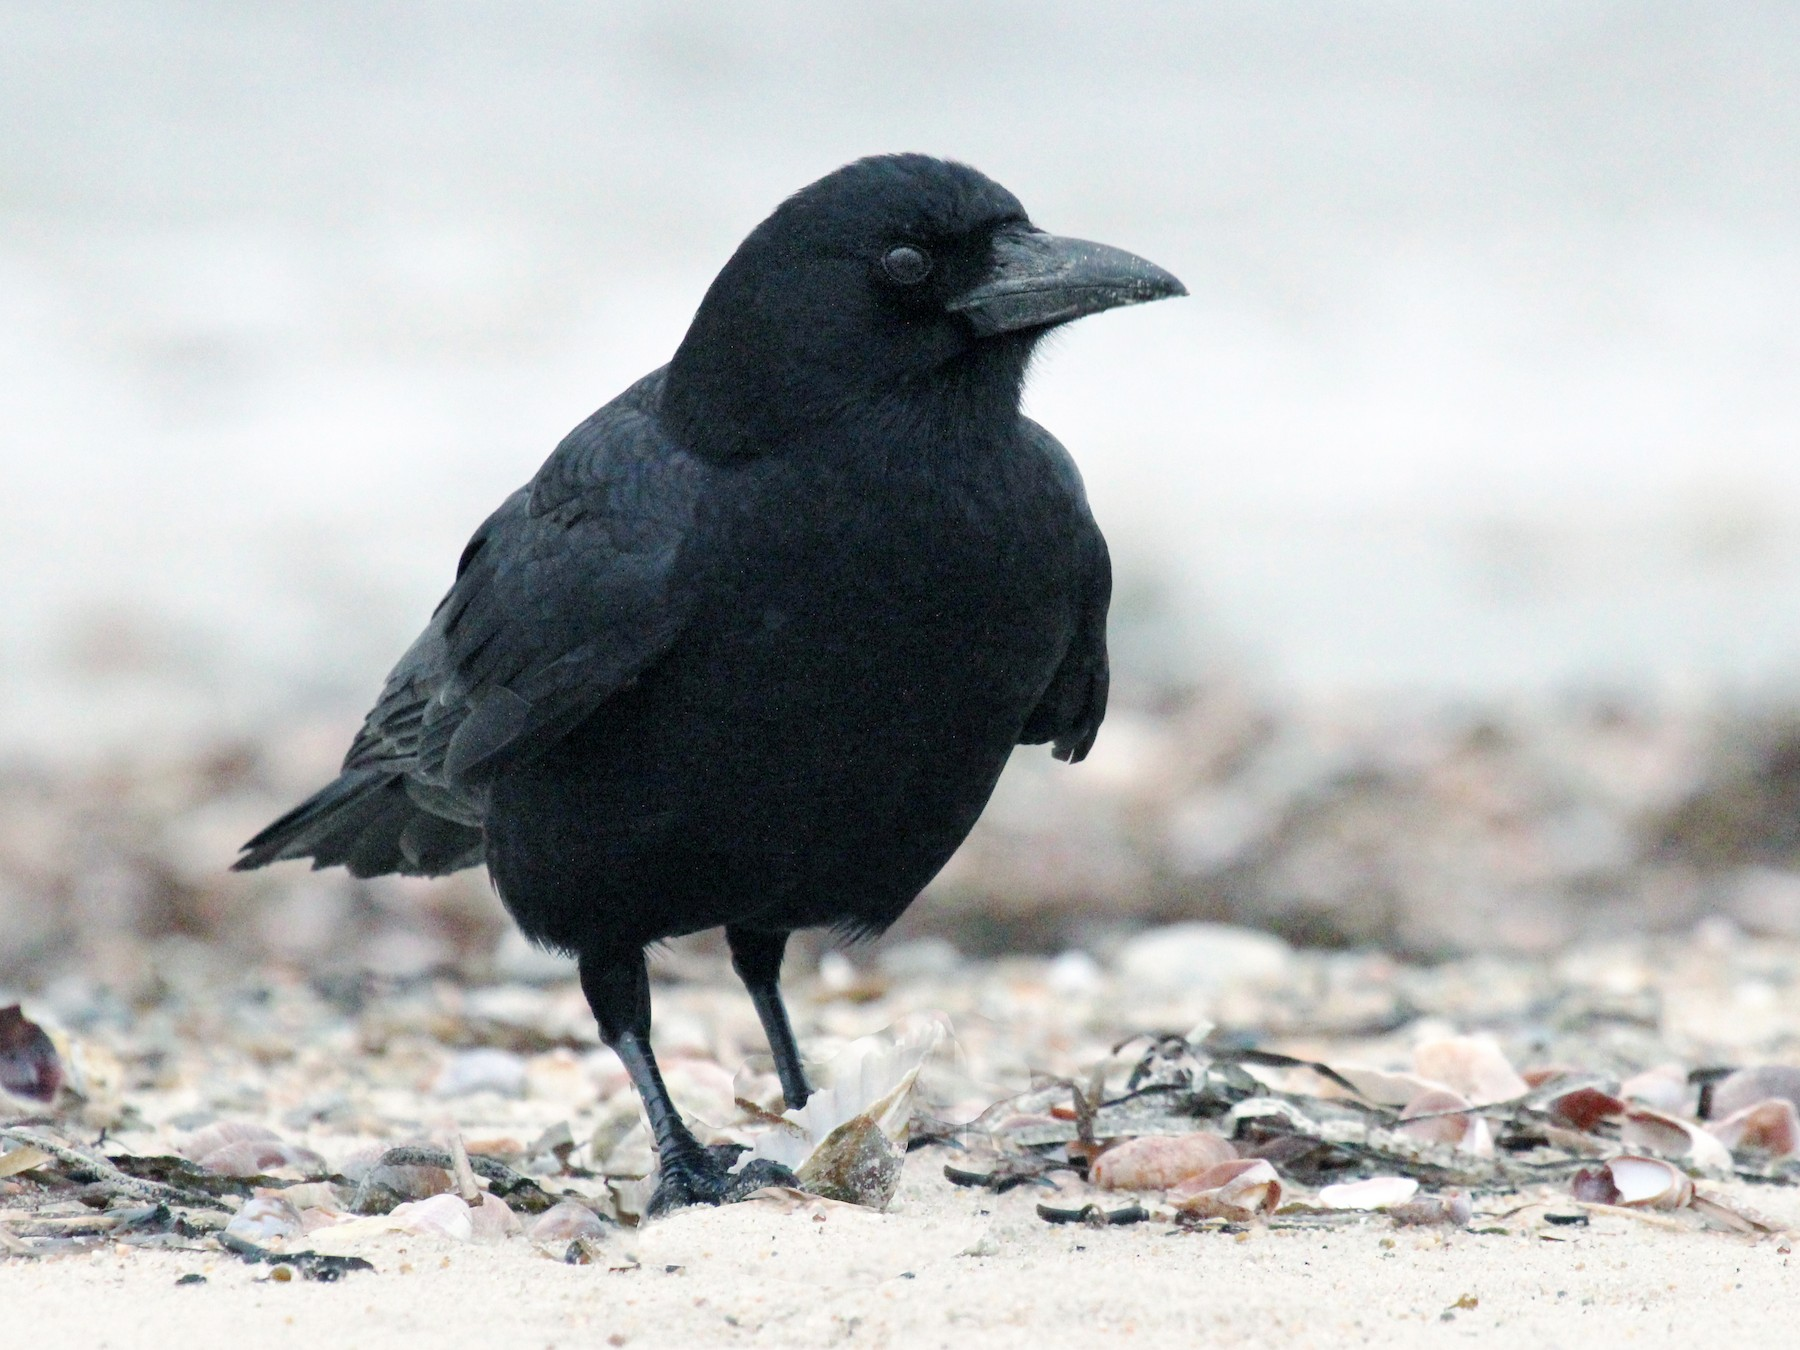 Fish Crow - Mike Schanbacher